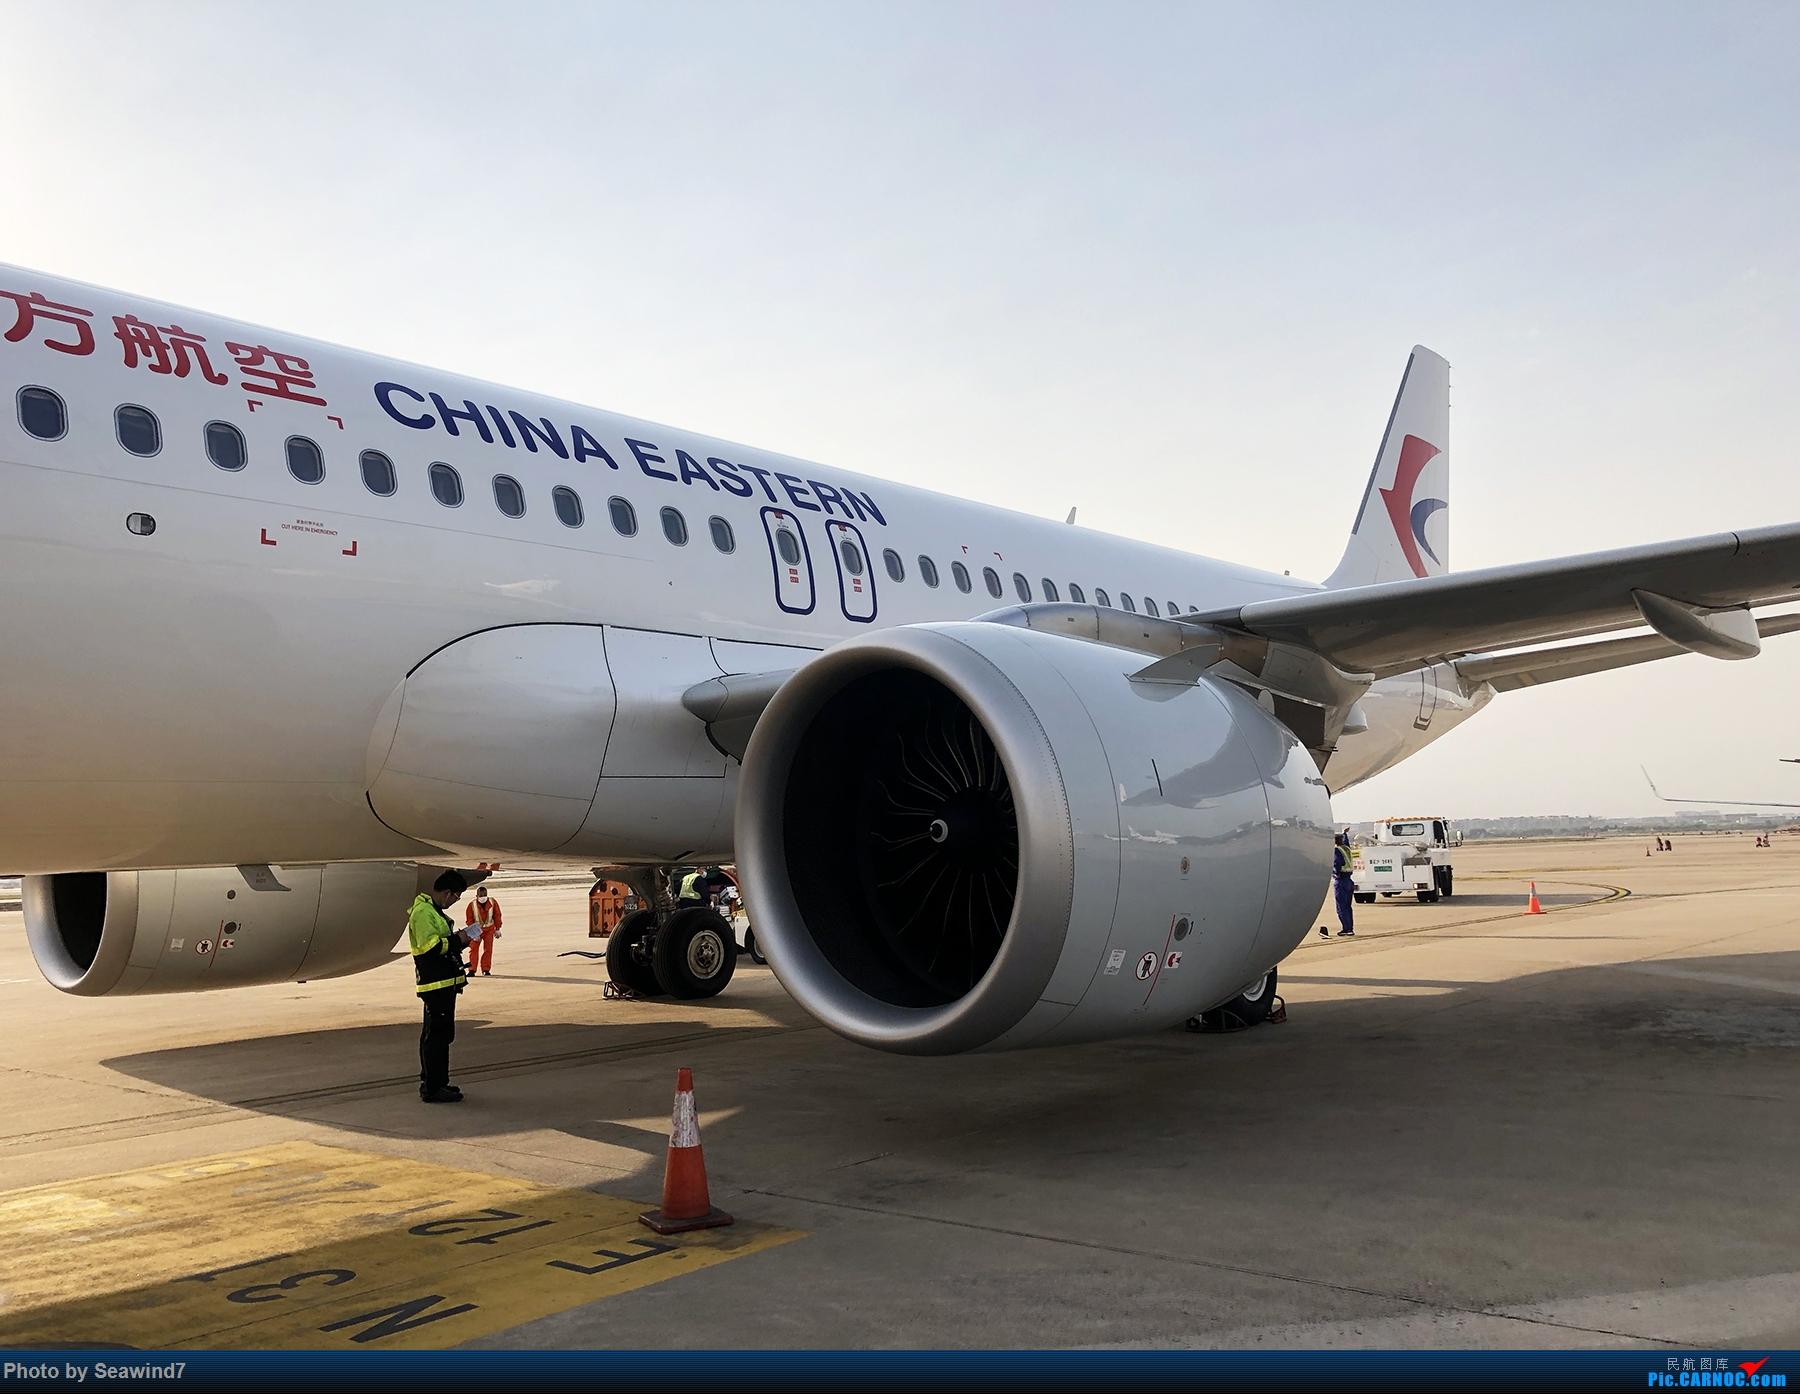 Re:[原创][Seawind7游记第五弹]银川neo往返 AIRBUS A320NEO  中国上海虹桥国际机场